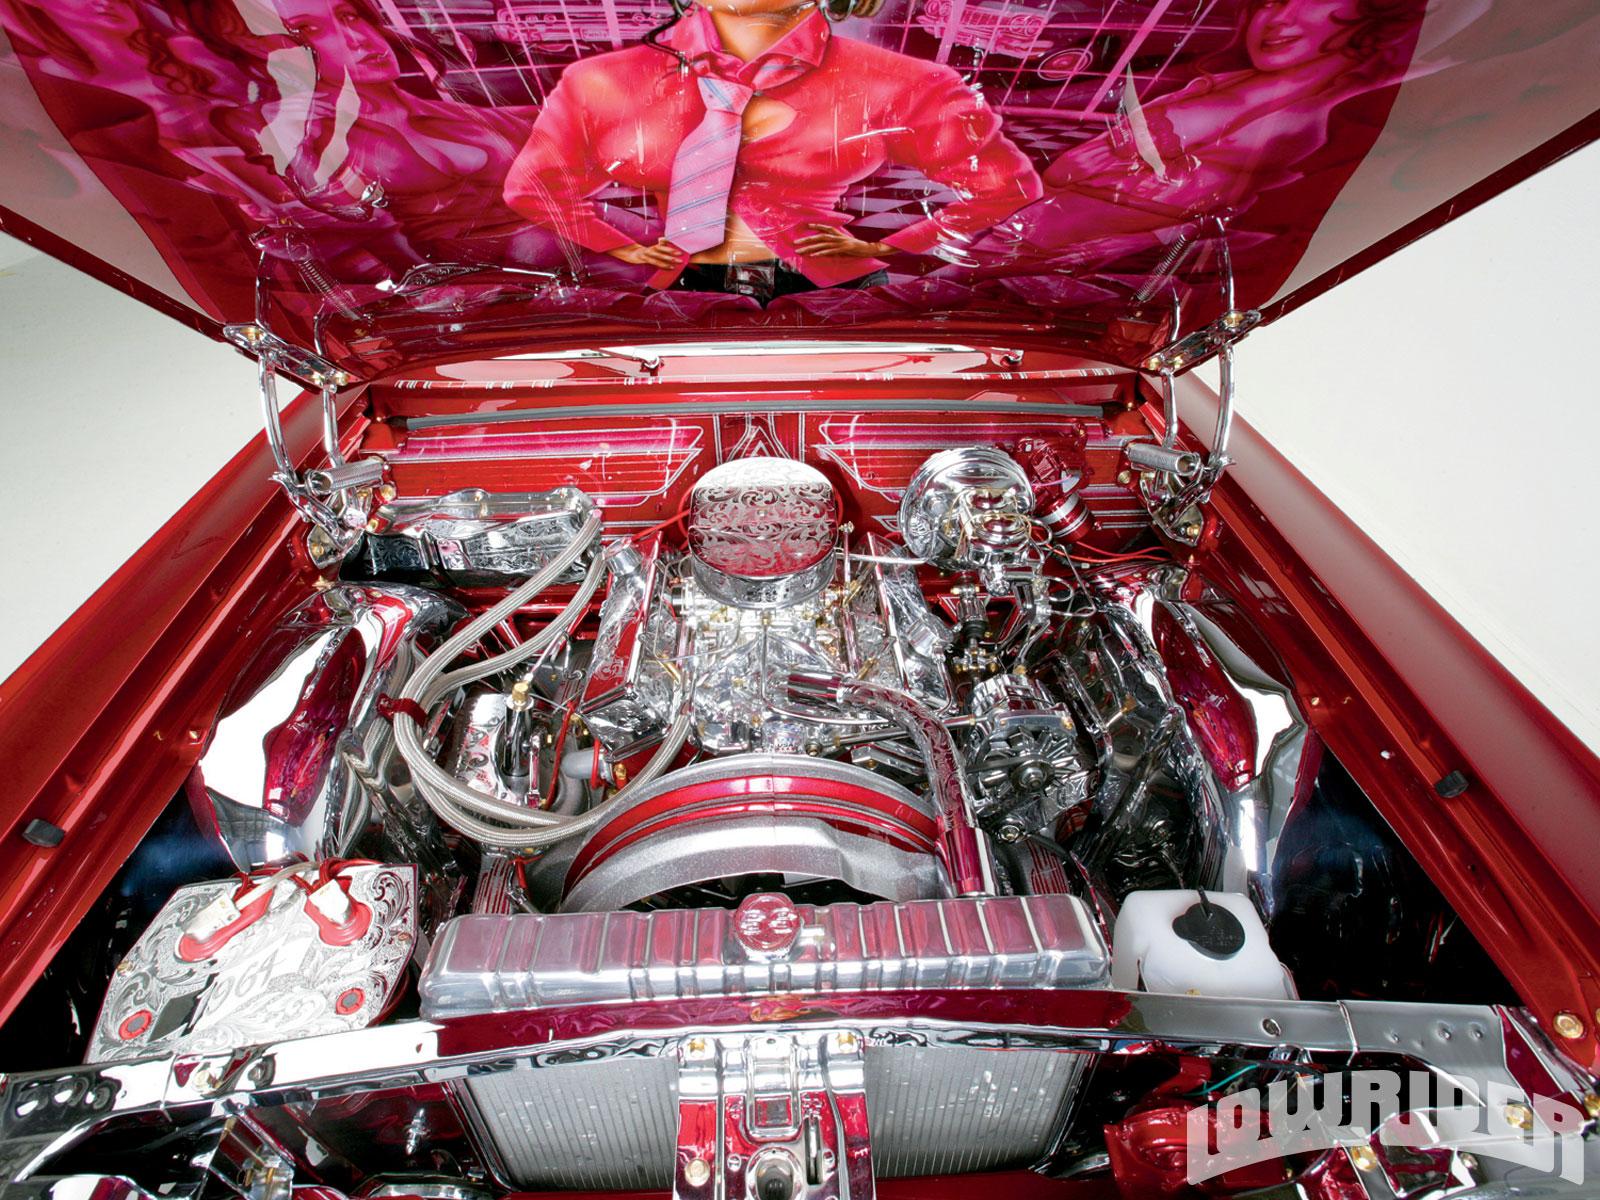 Lrmp O Chevrolet Impala Engine Bay on All Car Body Parts Named